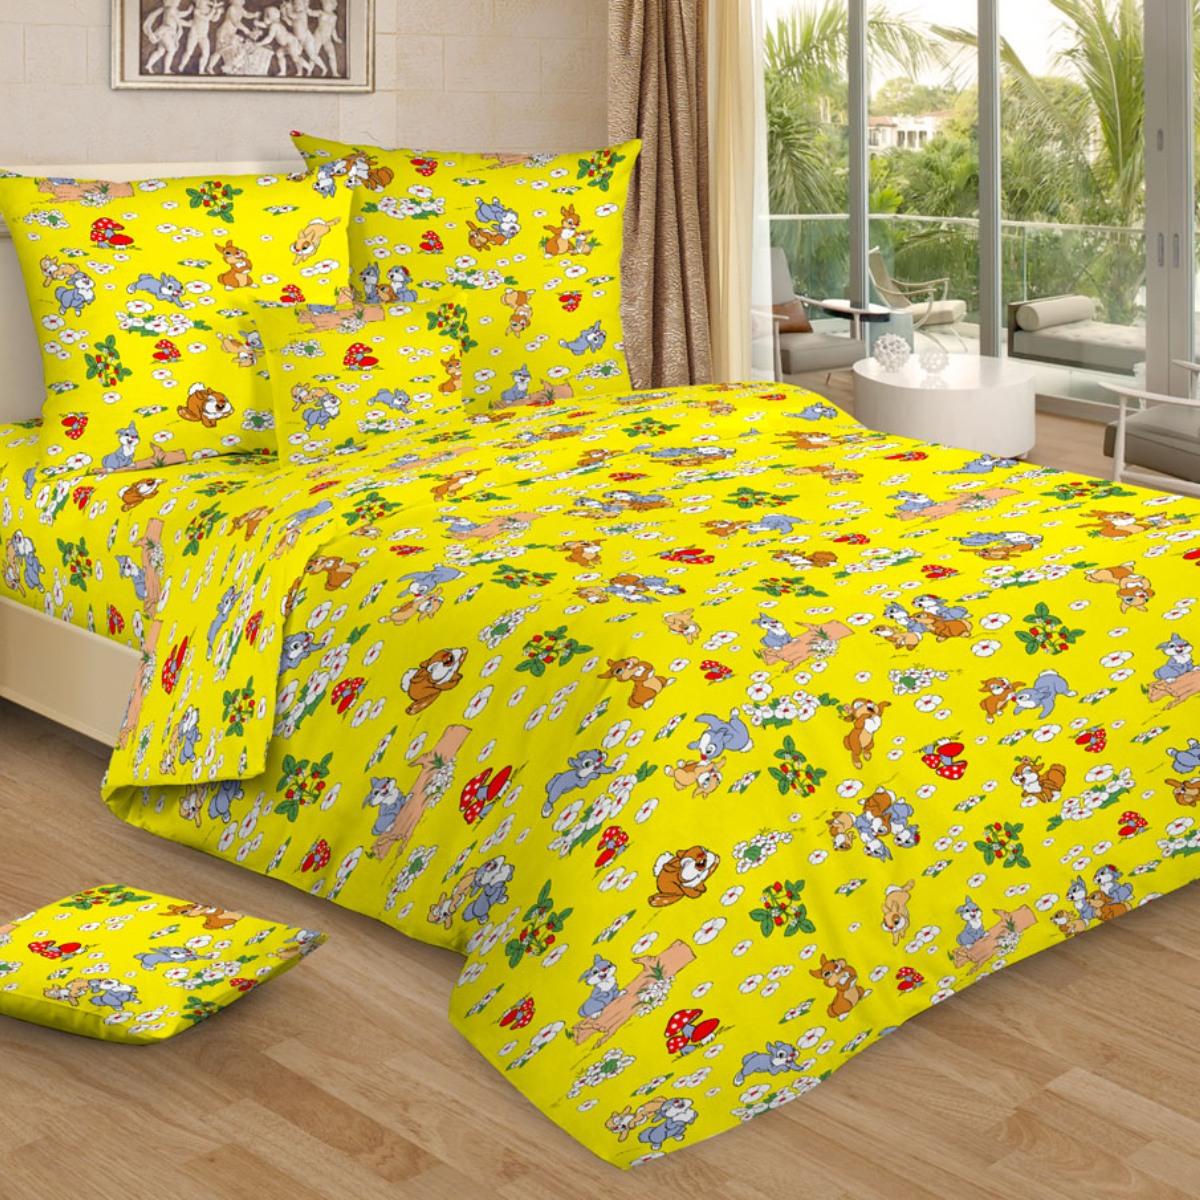 Letto Комплект в кроватку цвет желтый BG-96